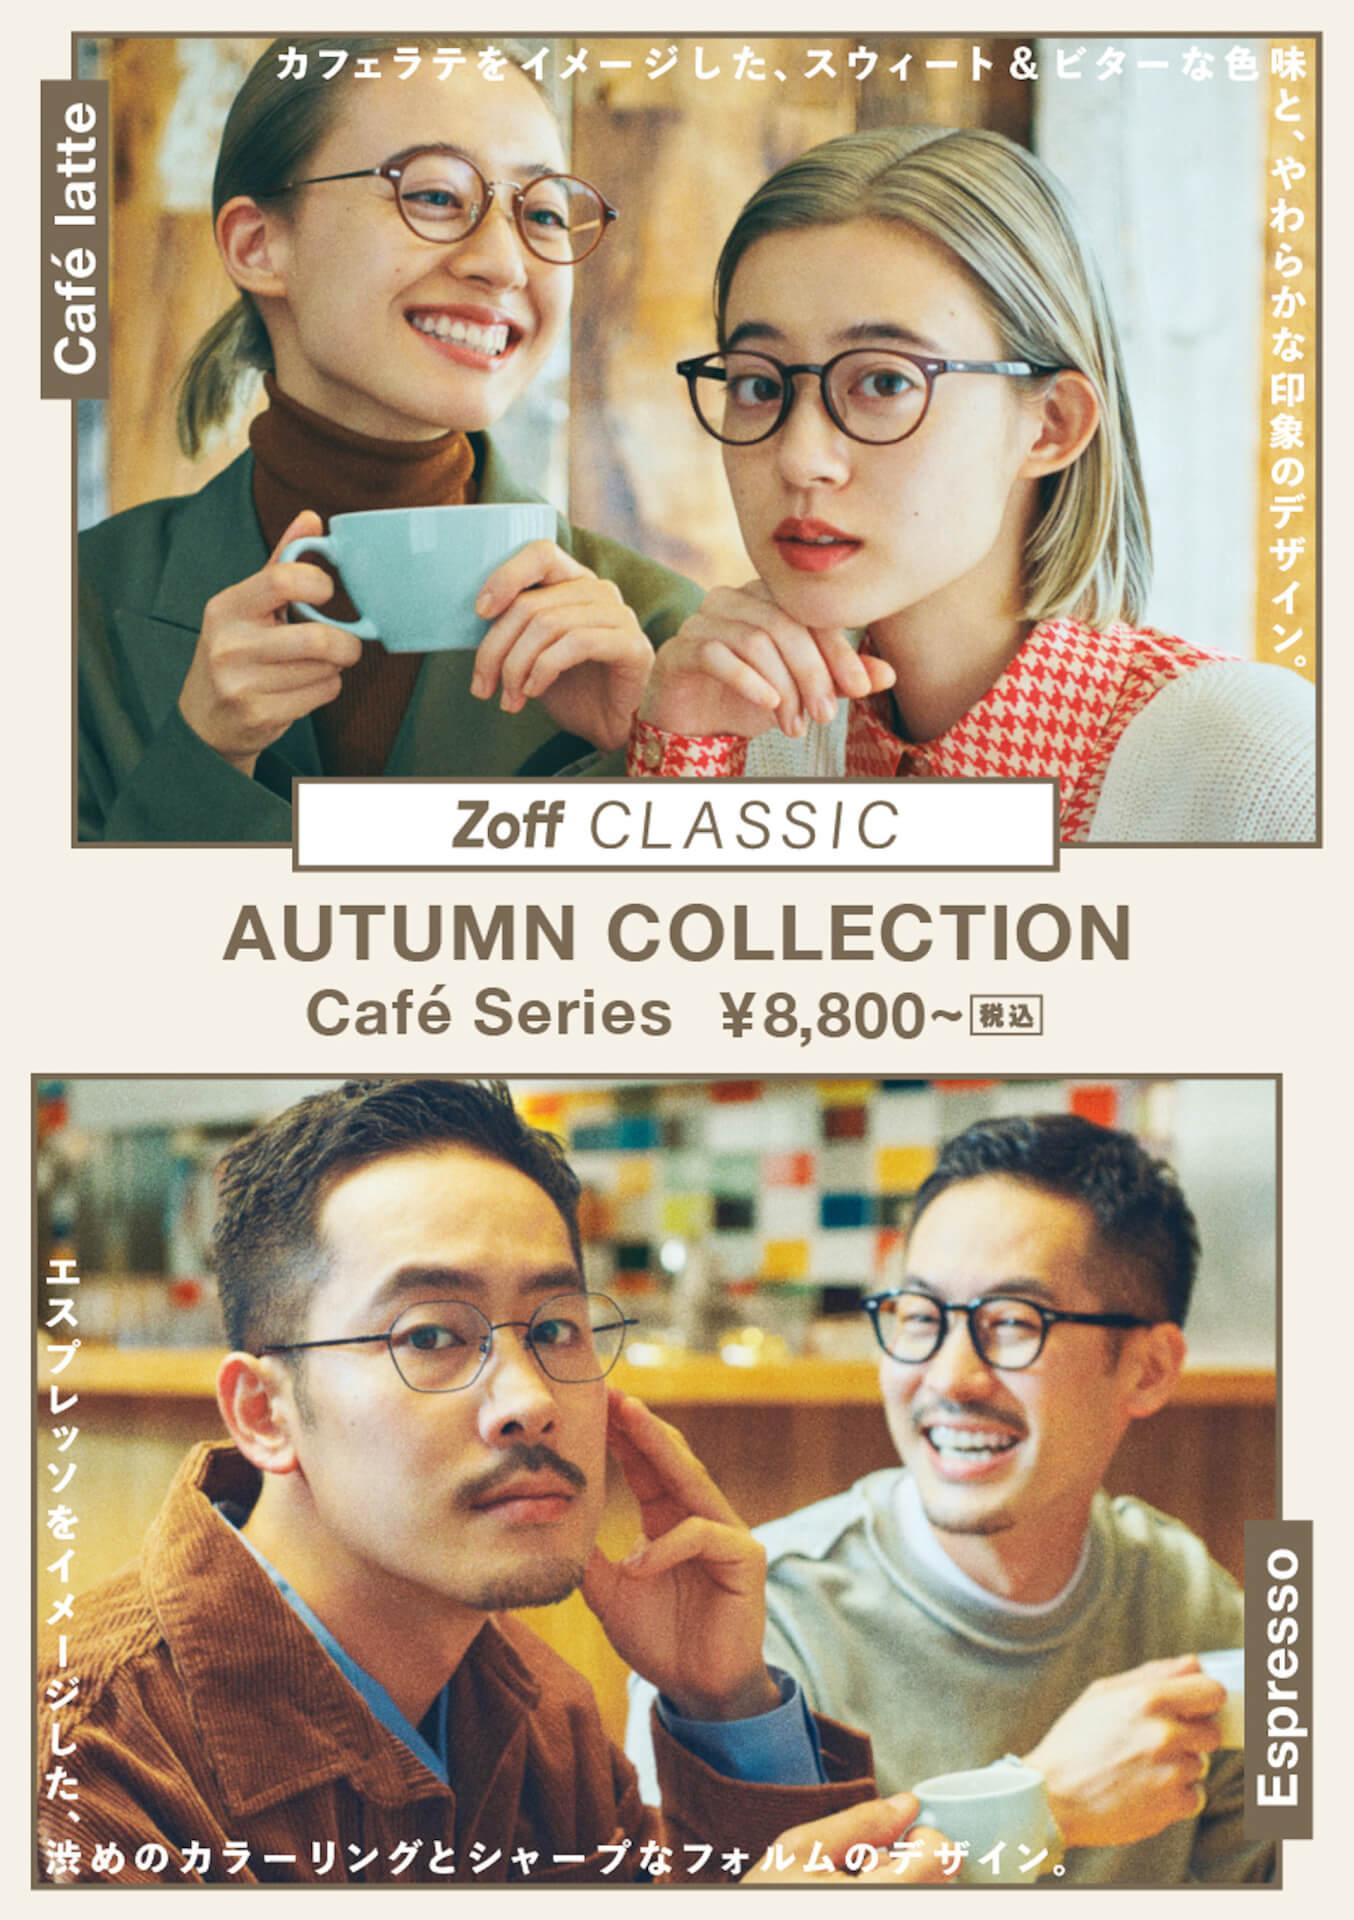 TENDRE&塩塚モエカが「Zoff CLASSIC AUTUMN COLLECTION」のモデルに!「Caffè Latte Line」&「Espresso Line」が発売決定 life210803_zoff_tendre_hitsujibungaku_8